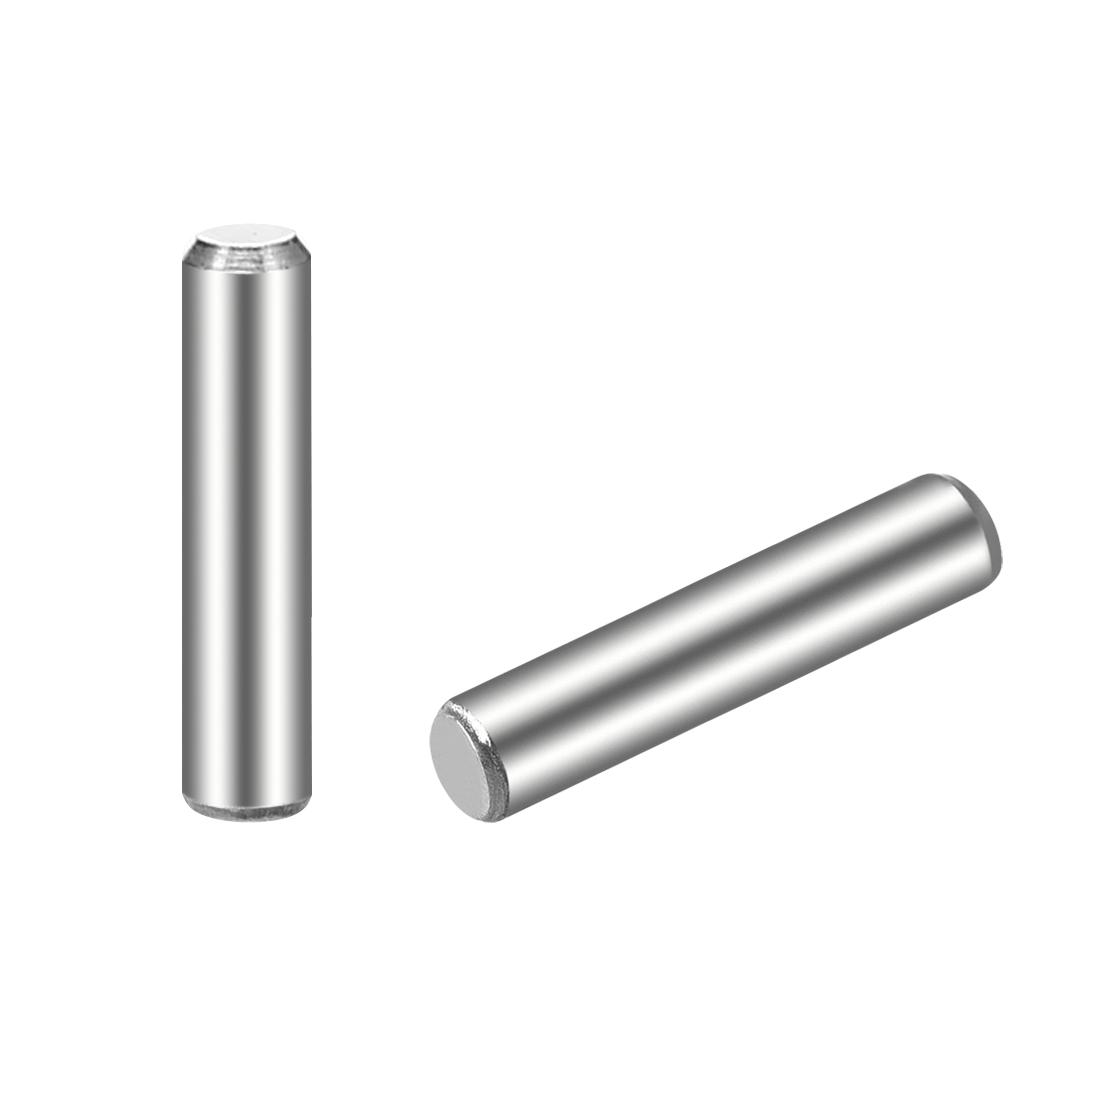 25Pcs 3mm x 14mm Dowel Pin 304 Stainless Steel Shelf Support Pin Fasten